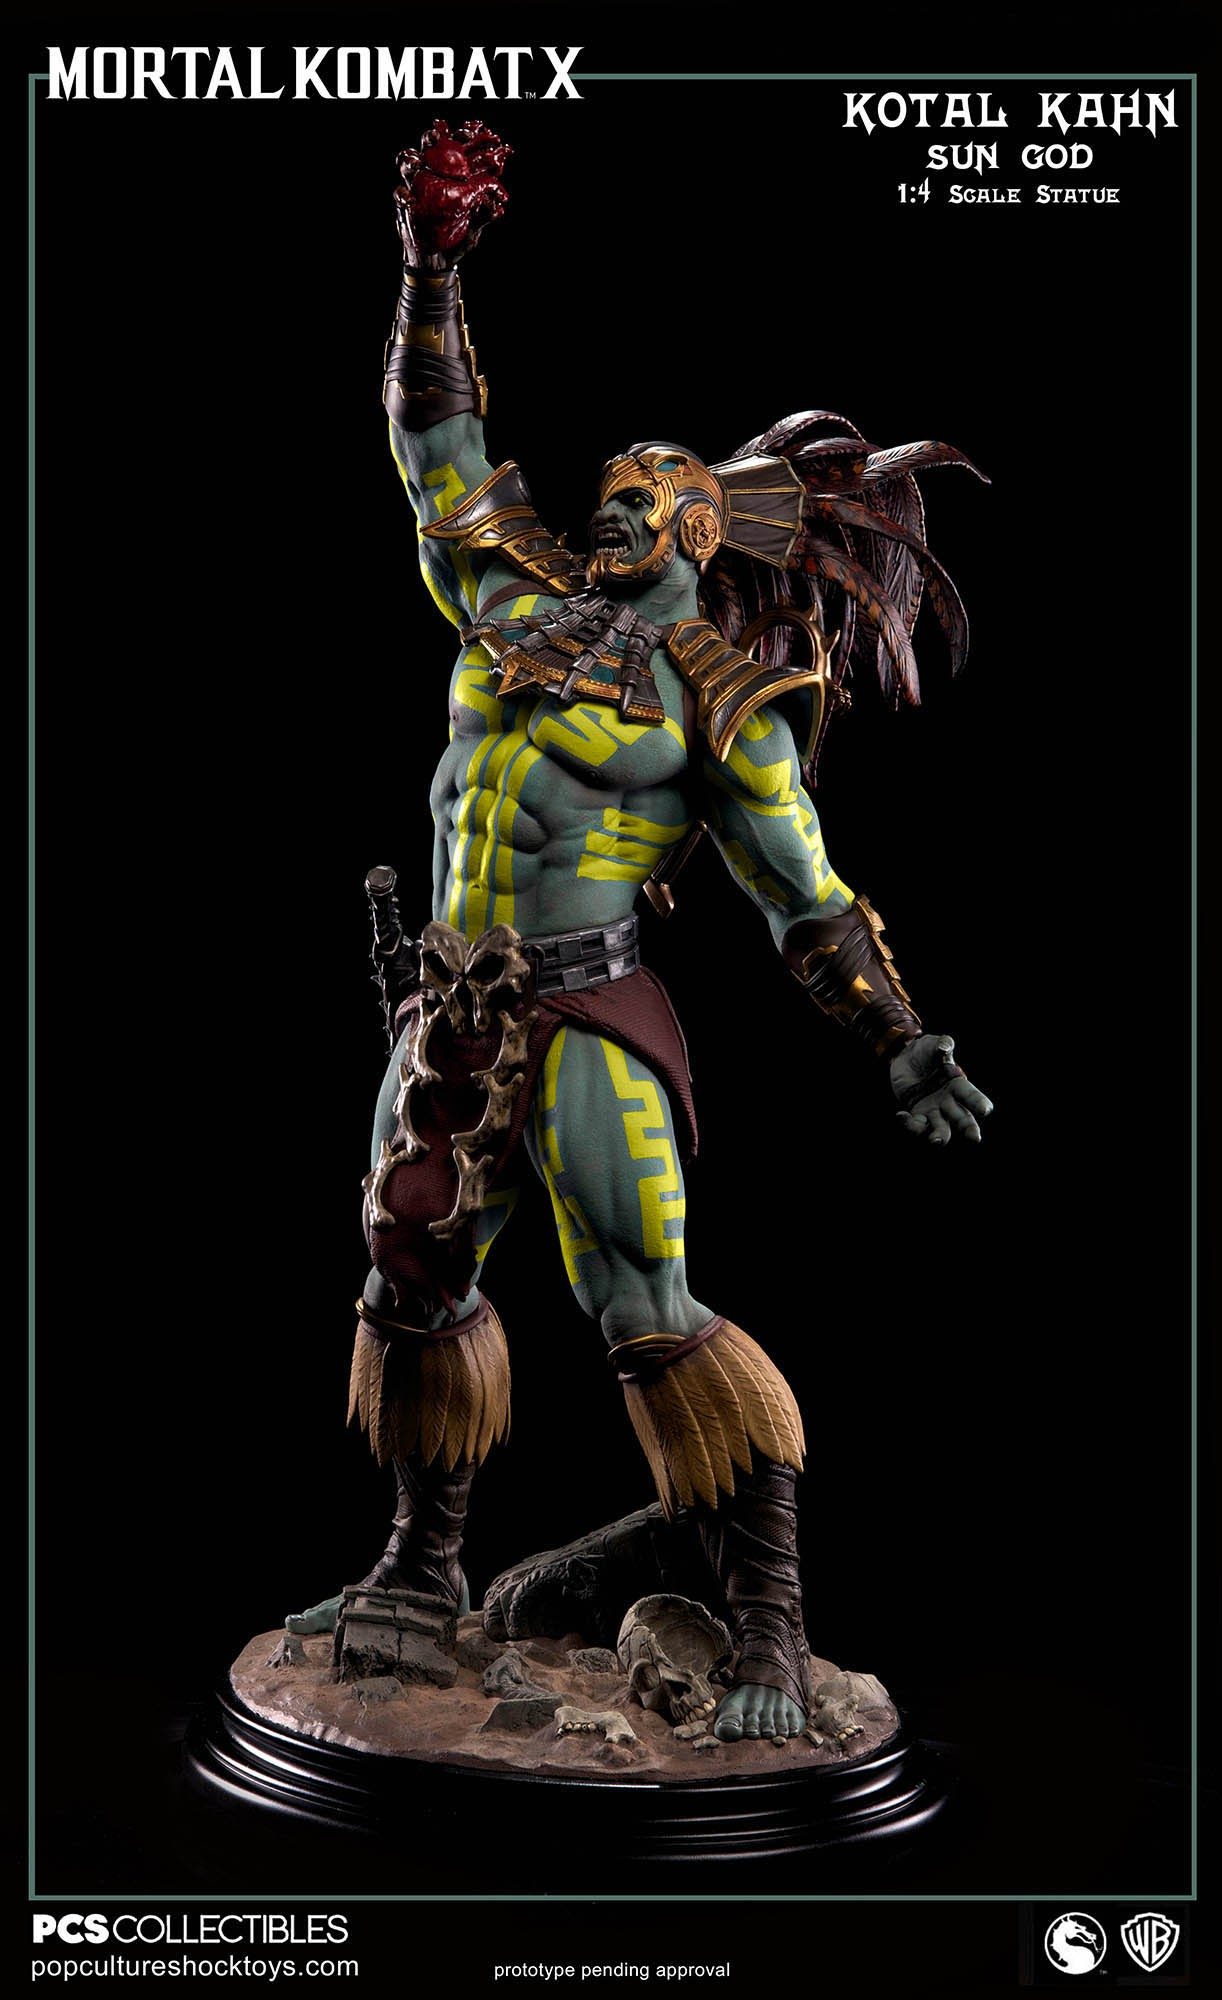 [Pop Culture Shock] Mortal Kombat X: Kotal Kahn 1:4 scale PCS-Kotal-Kahn-Sun-God-007